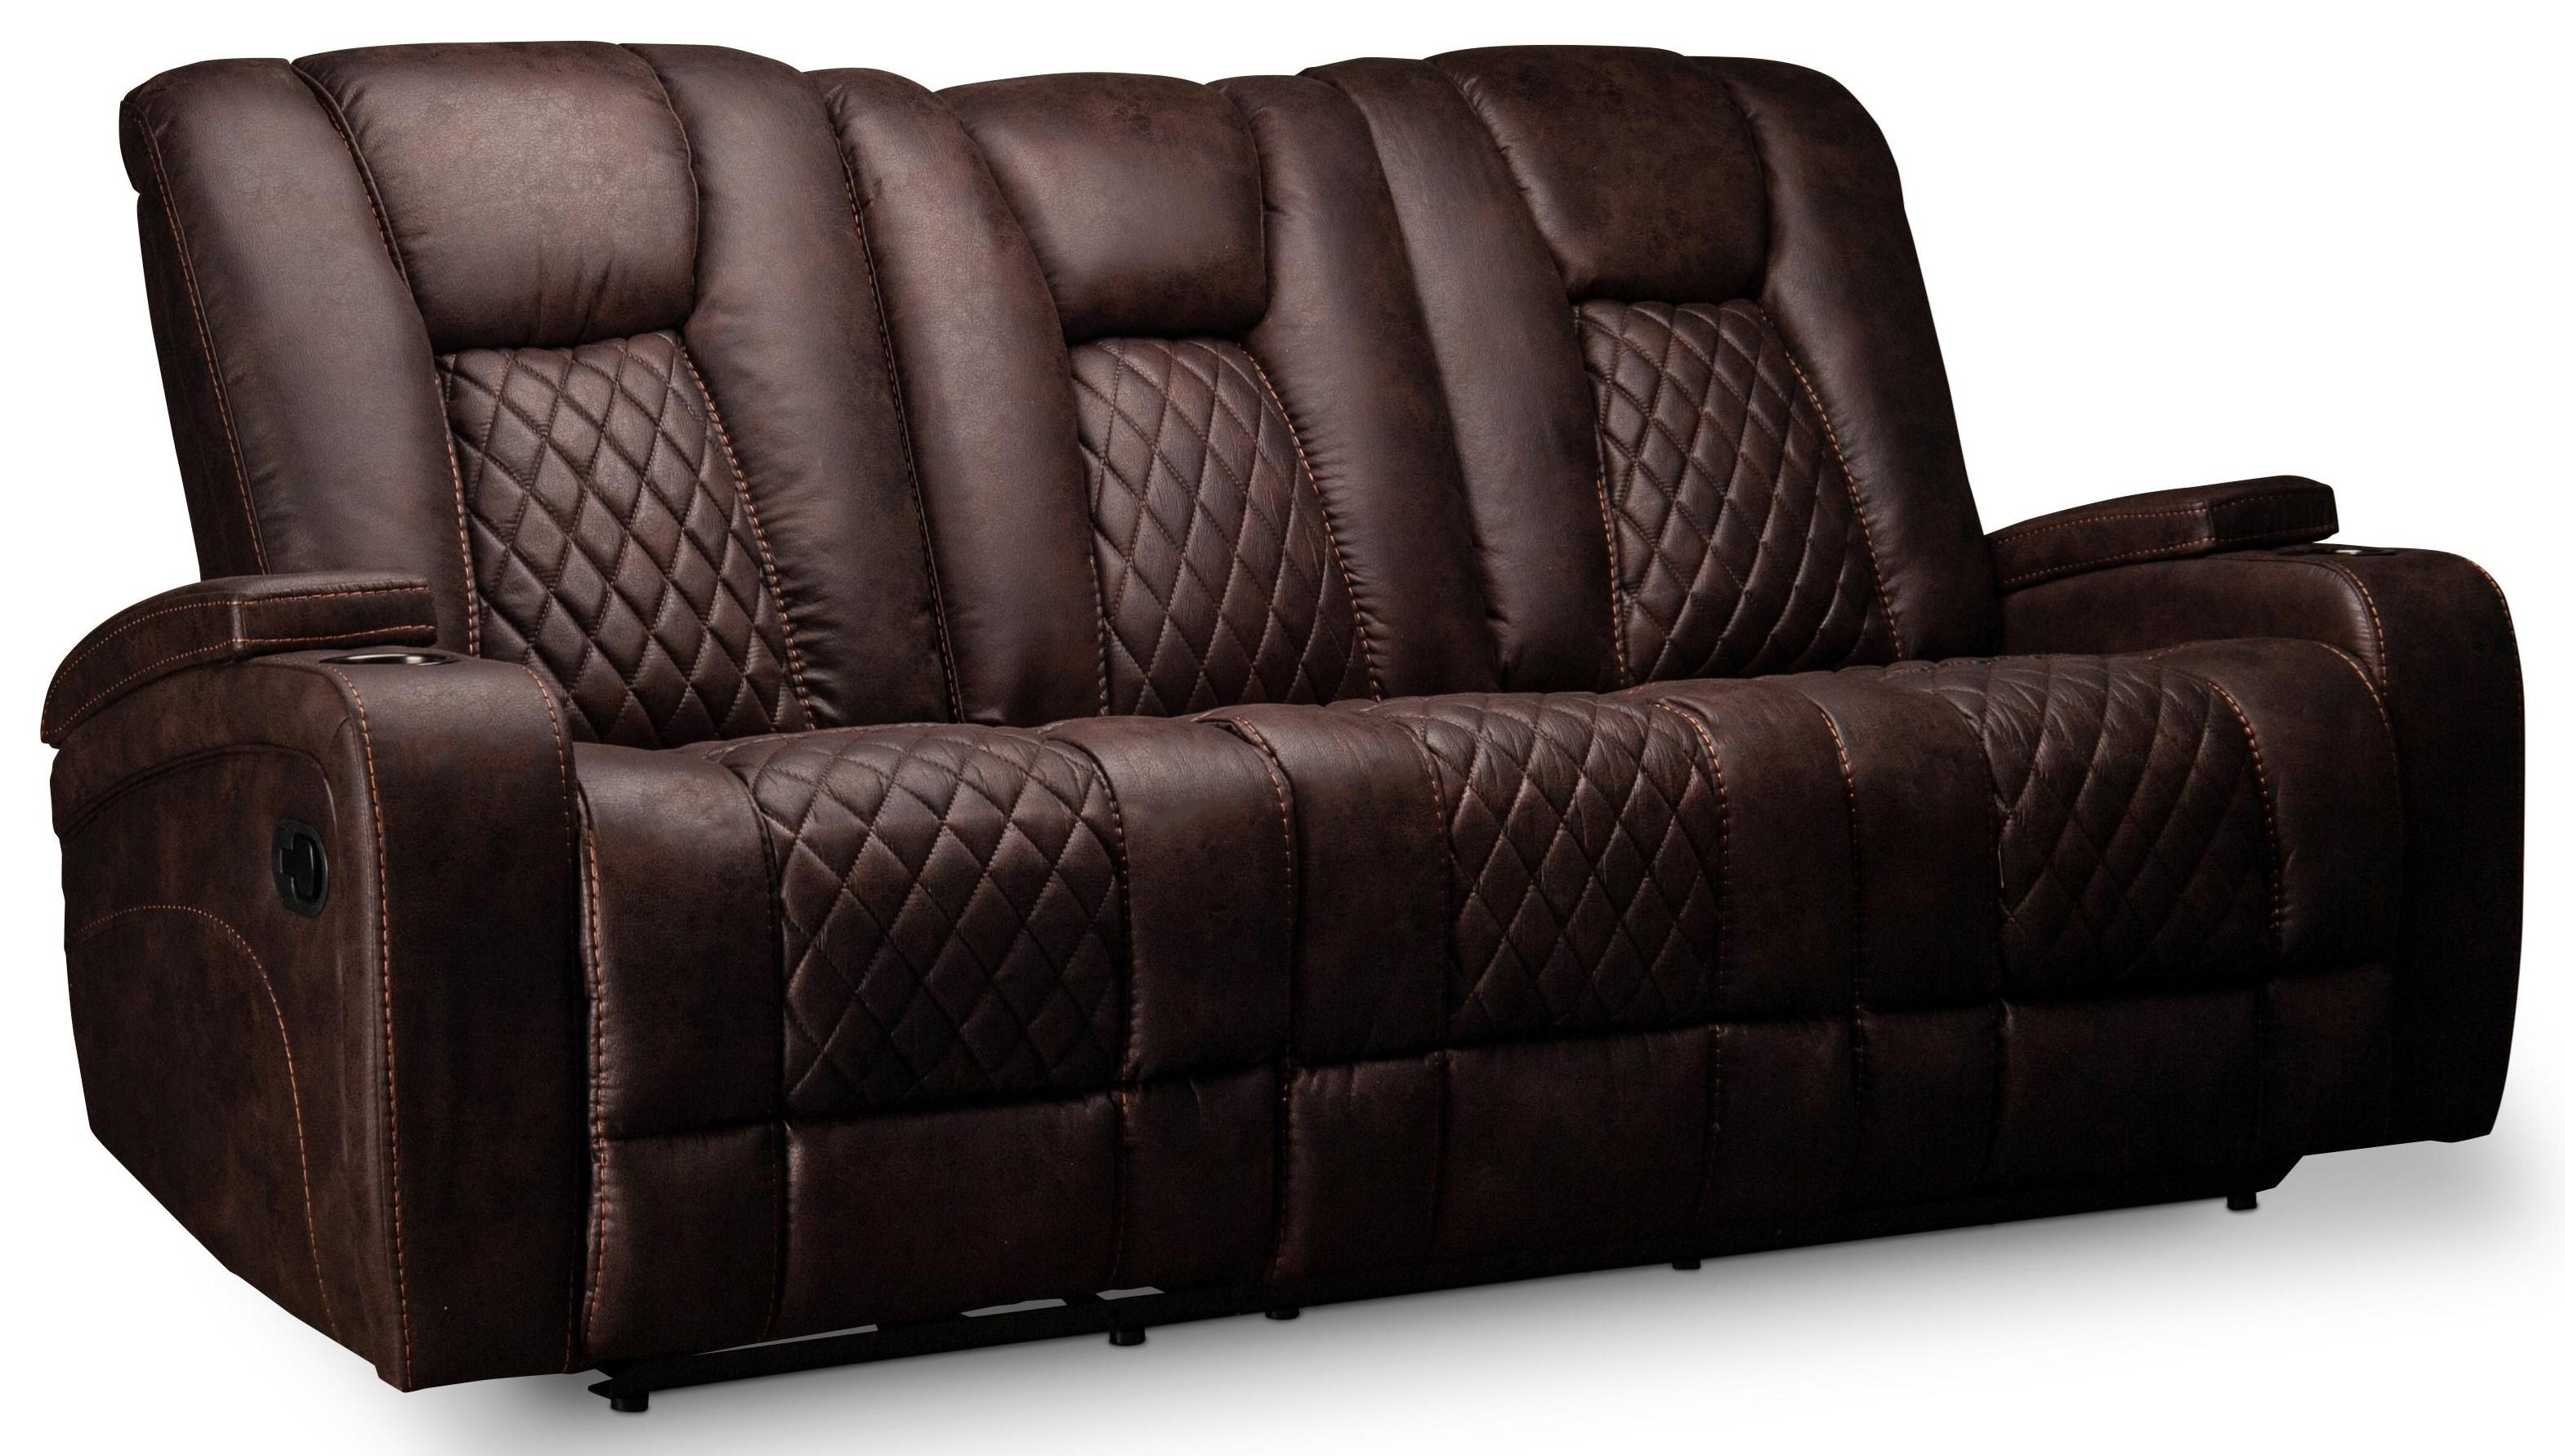 Tallis Tallis Reclining Sofa with Drop Down Table at Morris Home